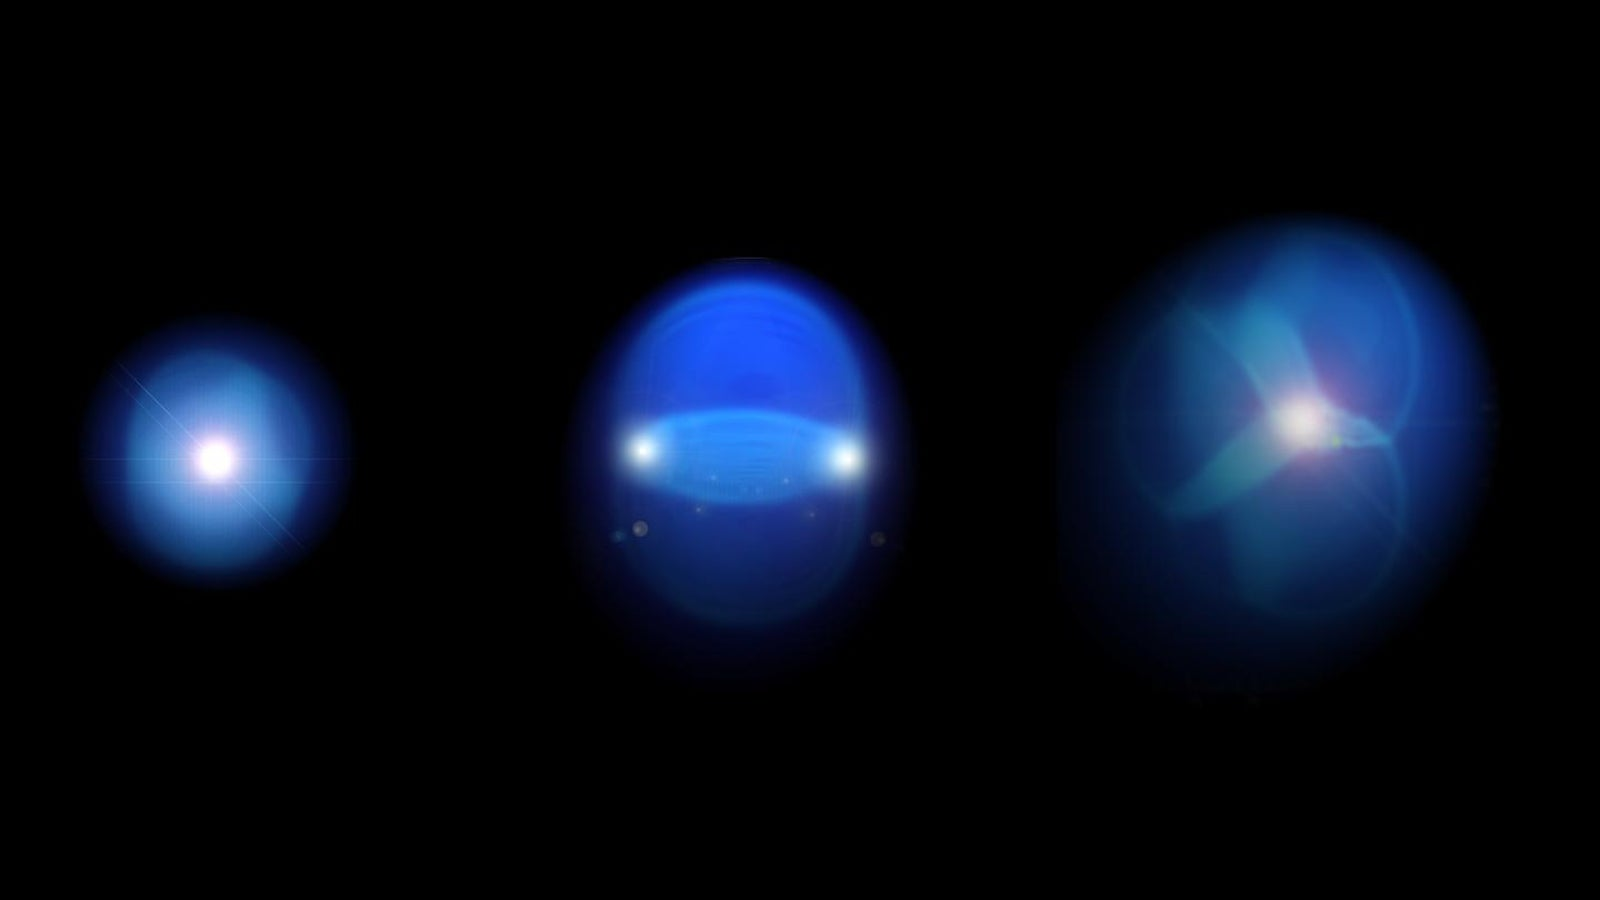 atlas big-bang eic large-hadron-collider lhc nuclear-physics particle-physics phenix quantum-chromodynamics quark-gluon-plasma rhic